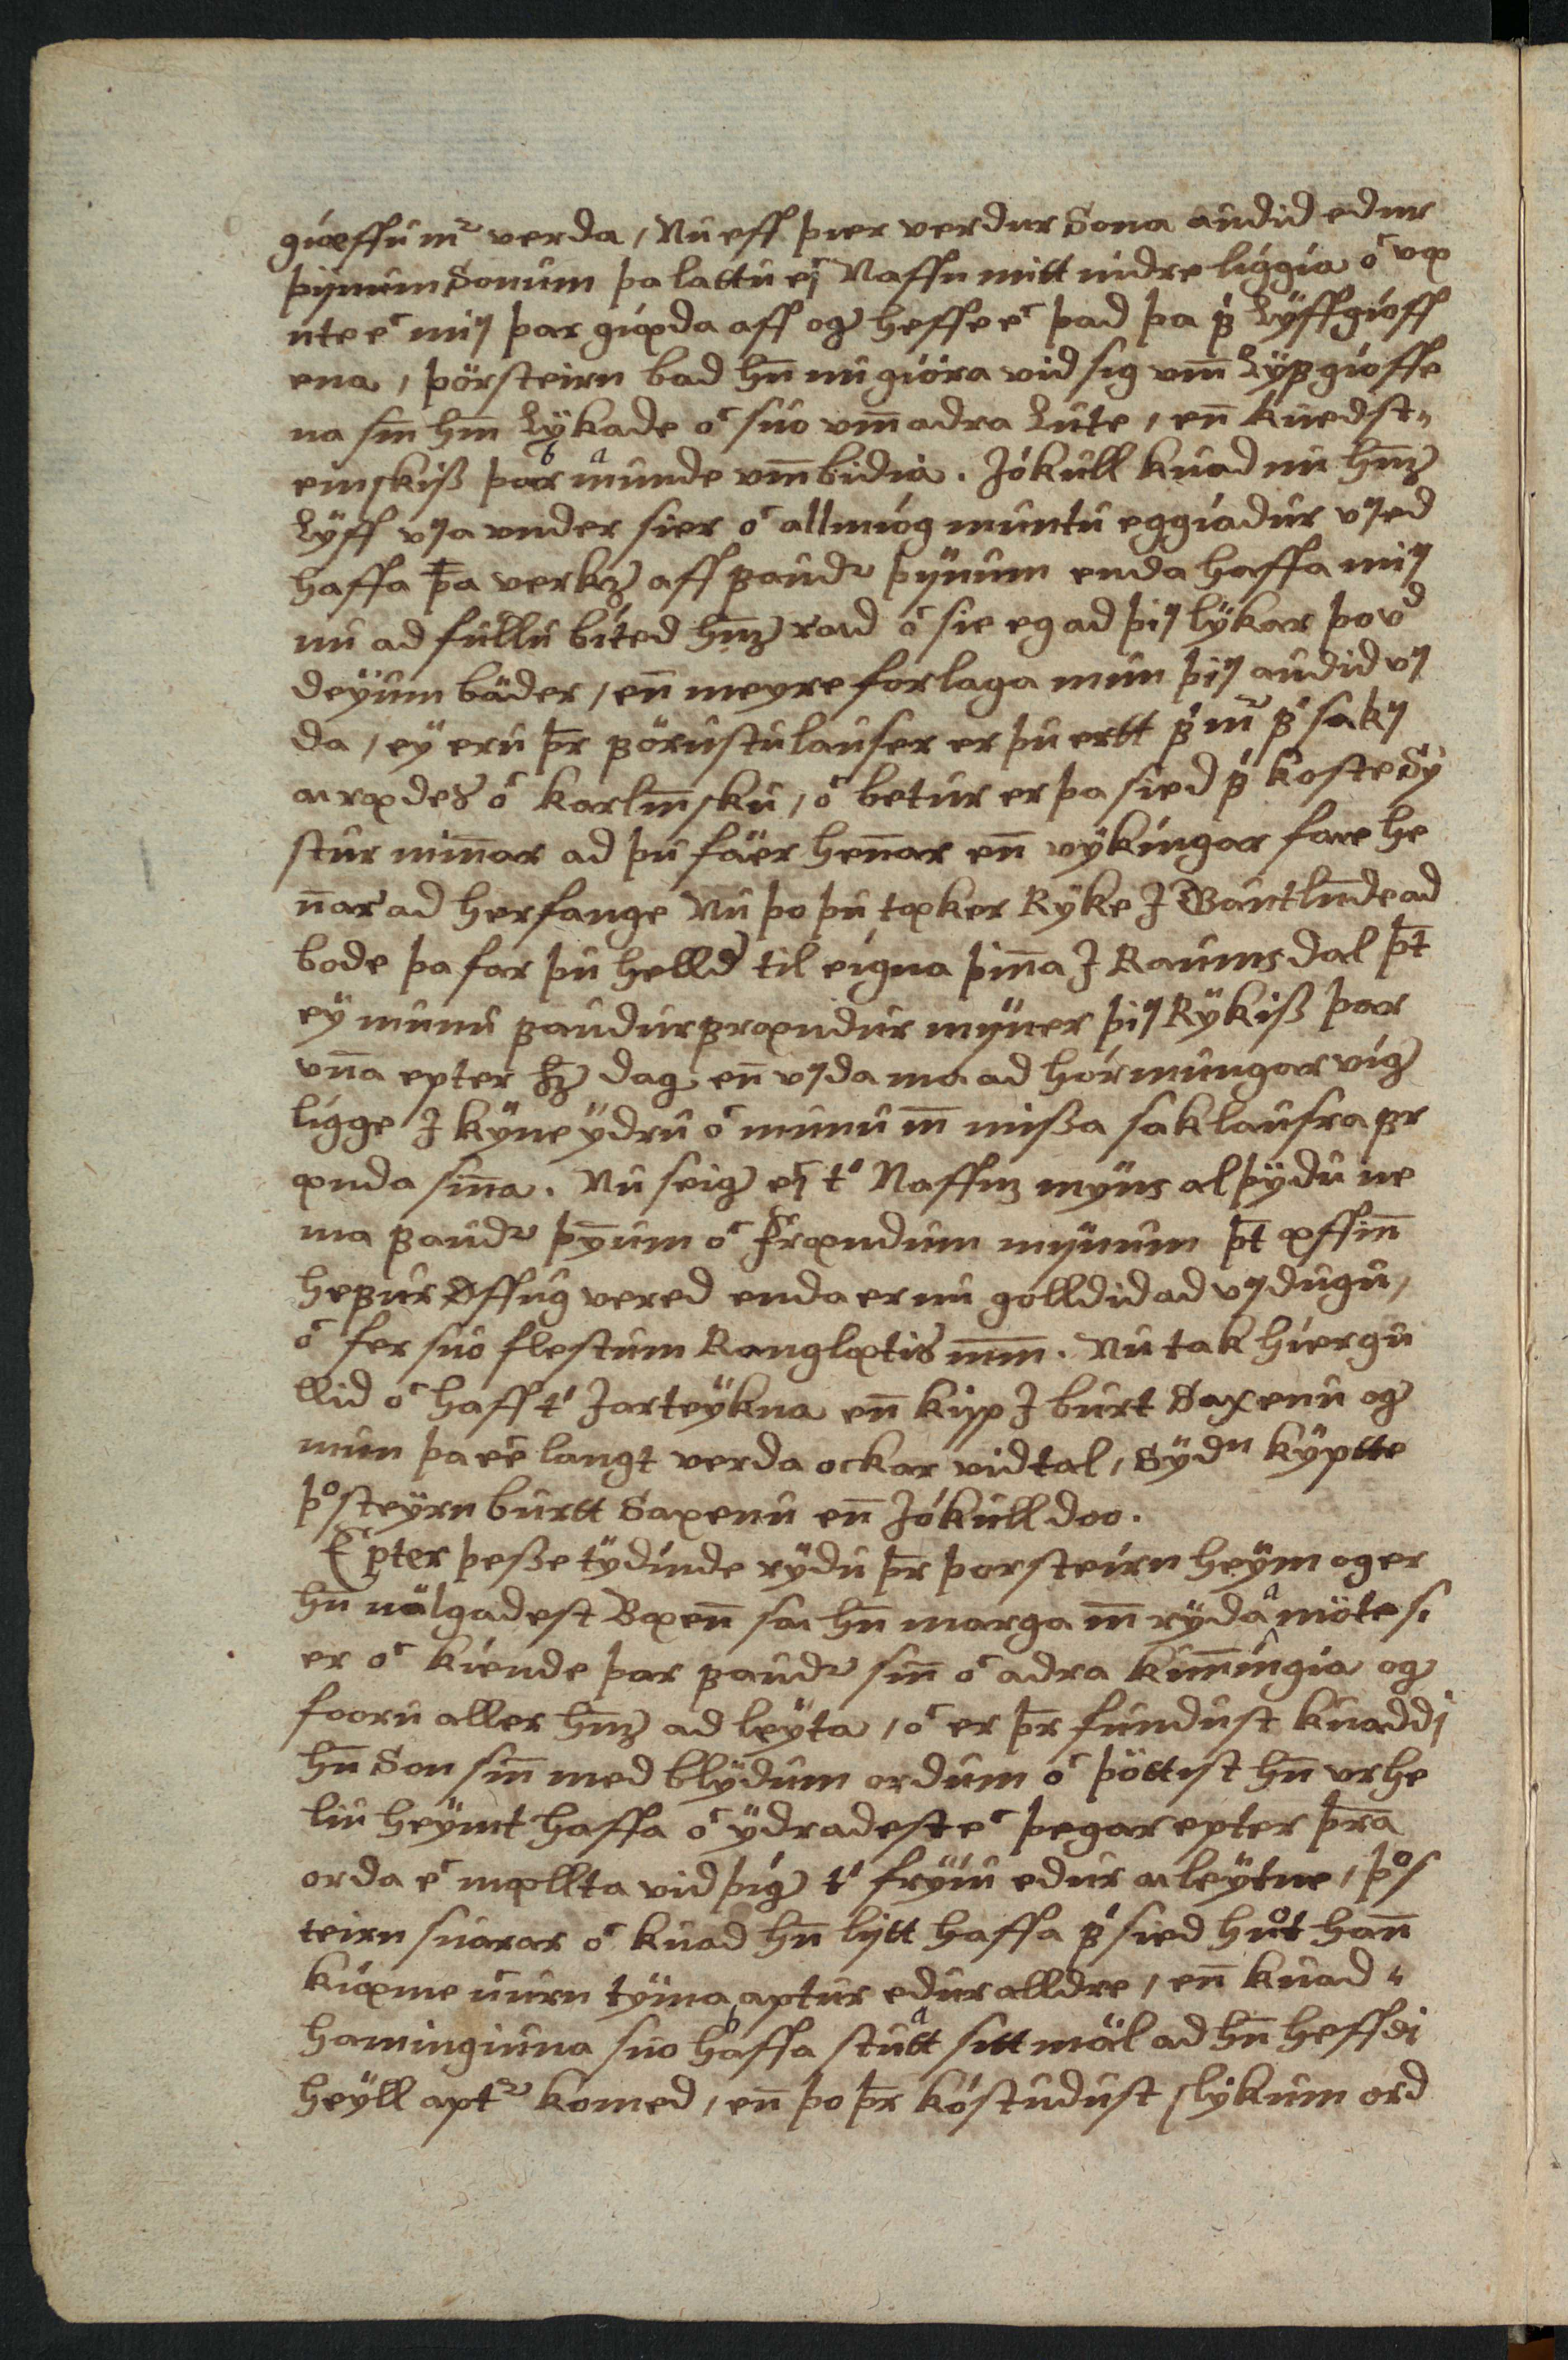 AM 138 fol - 3v